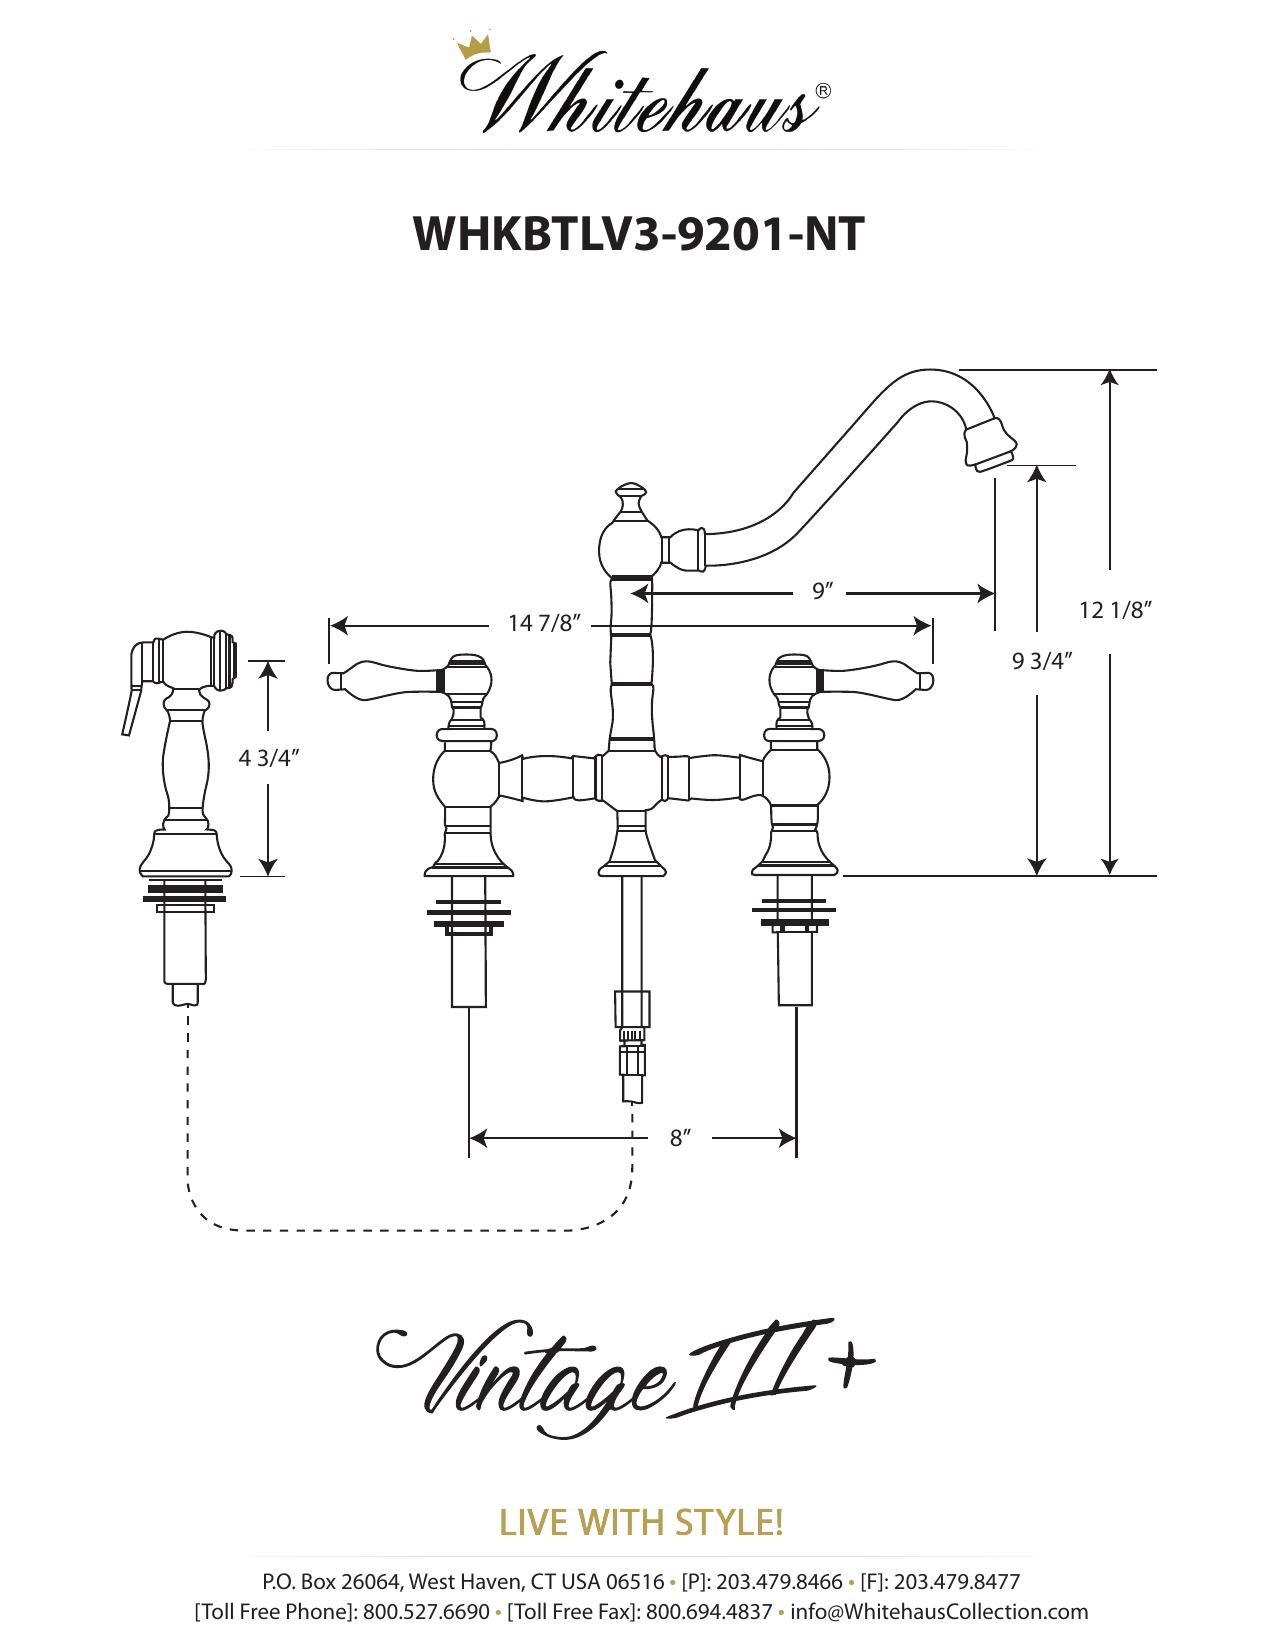 Whitehaus Collection WHKBTLV3-9201-NT-AB Vintage III Plus